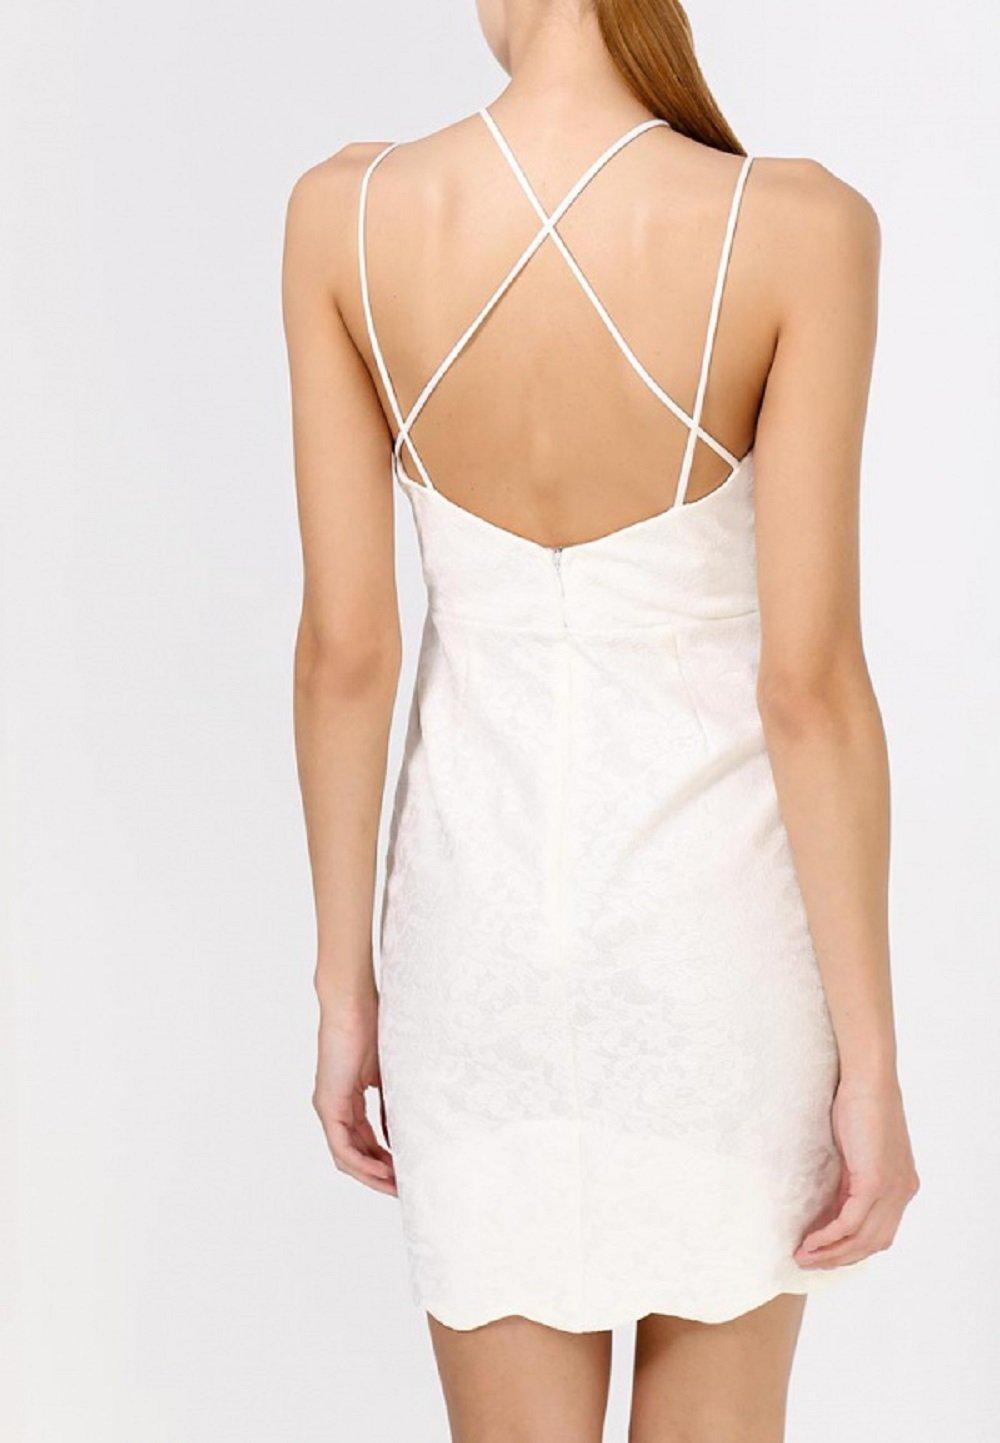 TOPSHOP Petite Scallop Lace Bodycon Dress White Cream Bridal Summer Party UK 14: Amazon.co.uk: Sports & Outdoors